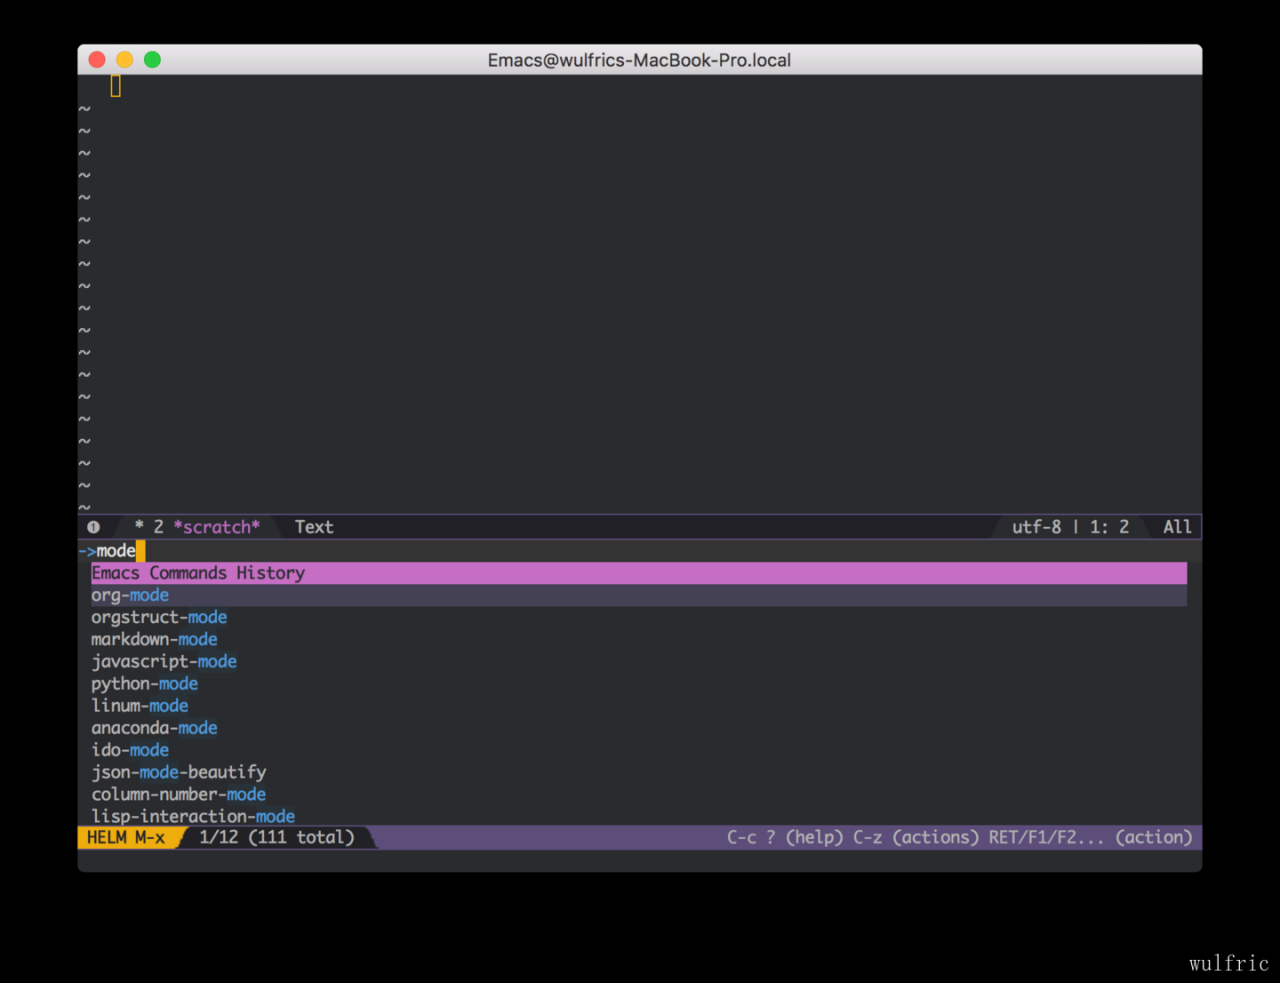 emacs major mode